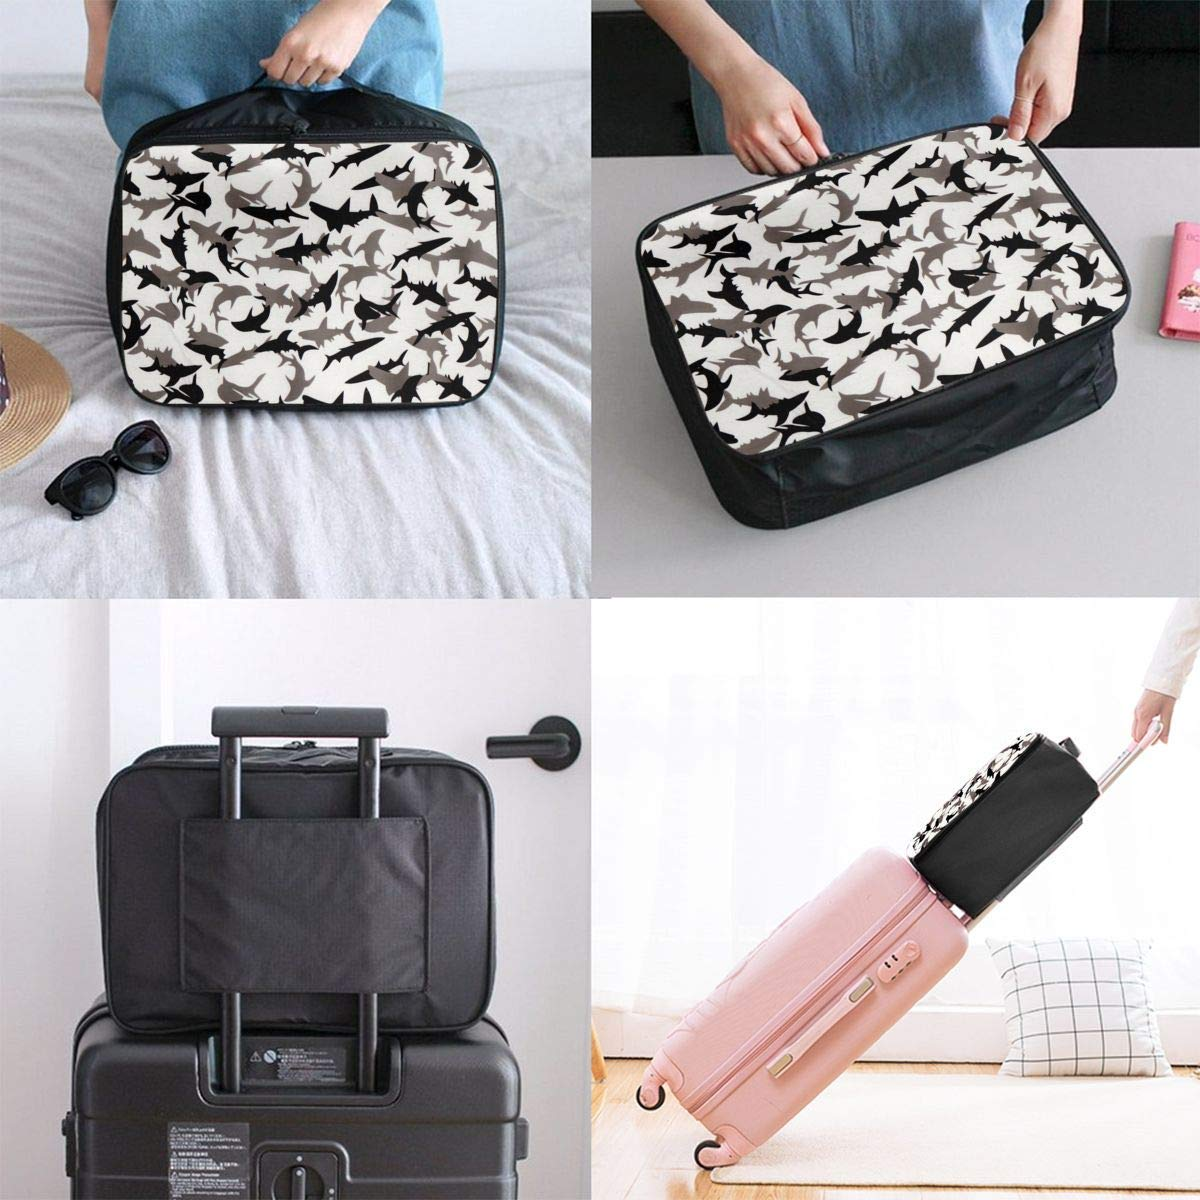 JTRVW Luggage Bags for Travel Shark Camo Travel Duffel Bag Waterproof Fashion Lightweight Large Capacity Portable Duffel Bag for Men /& Women